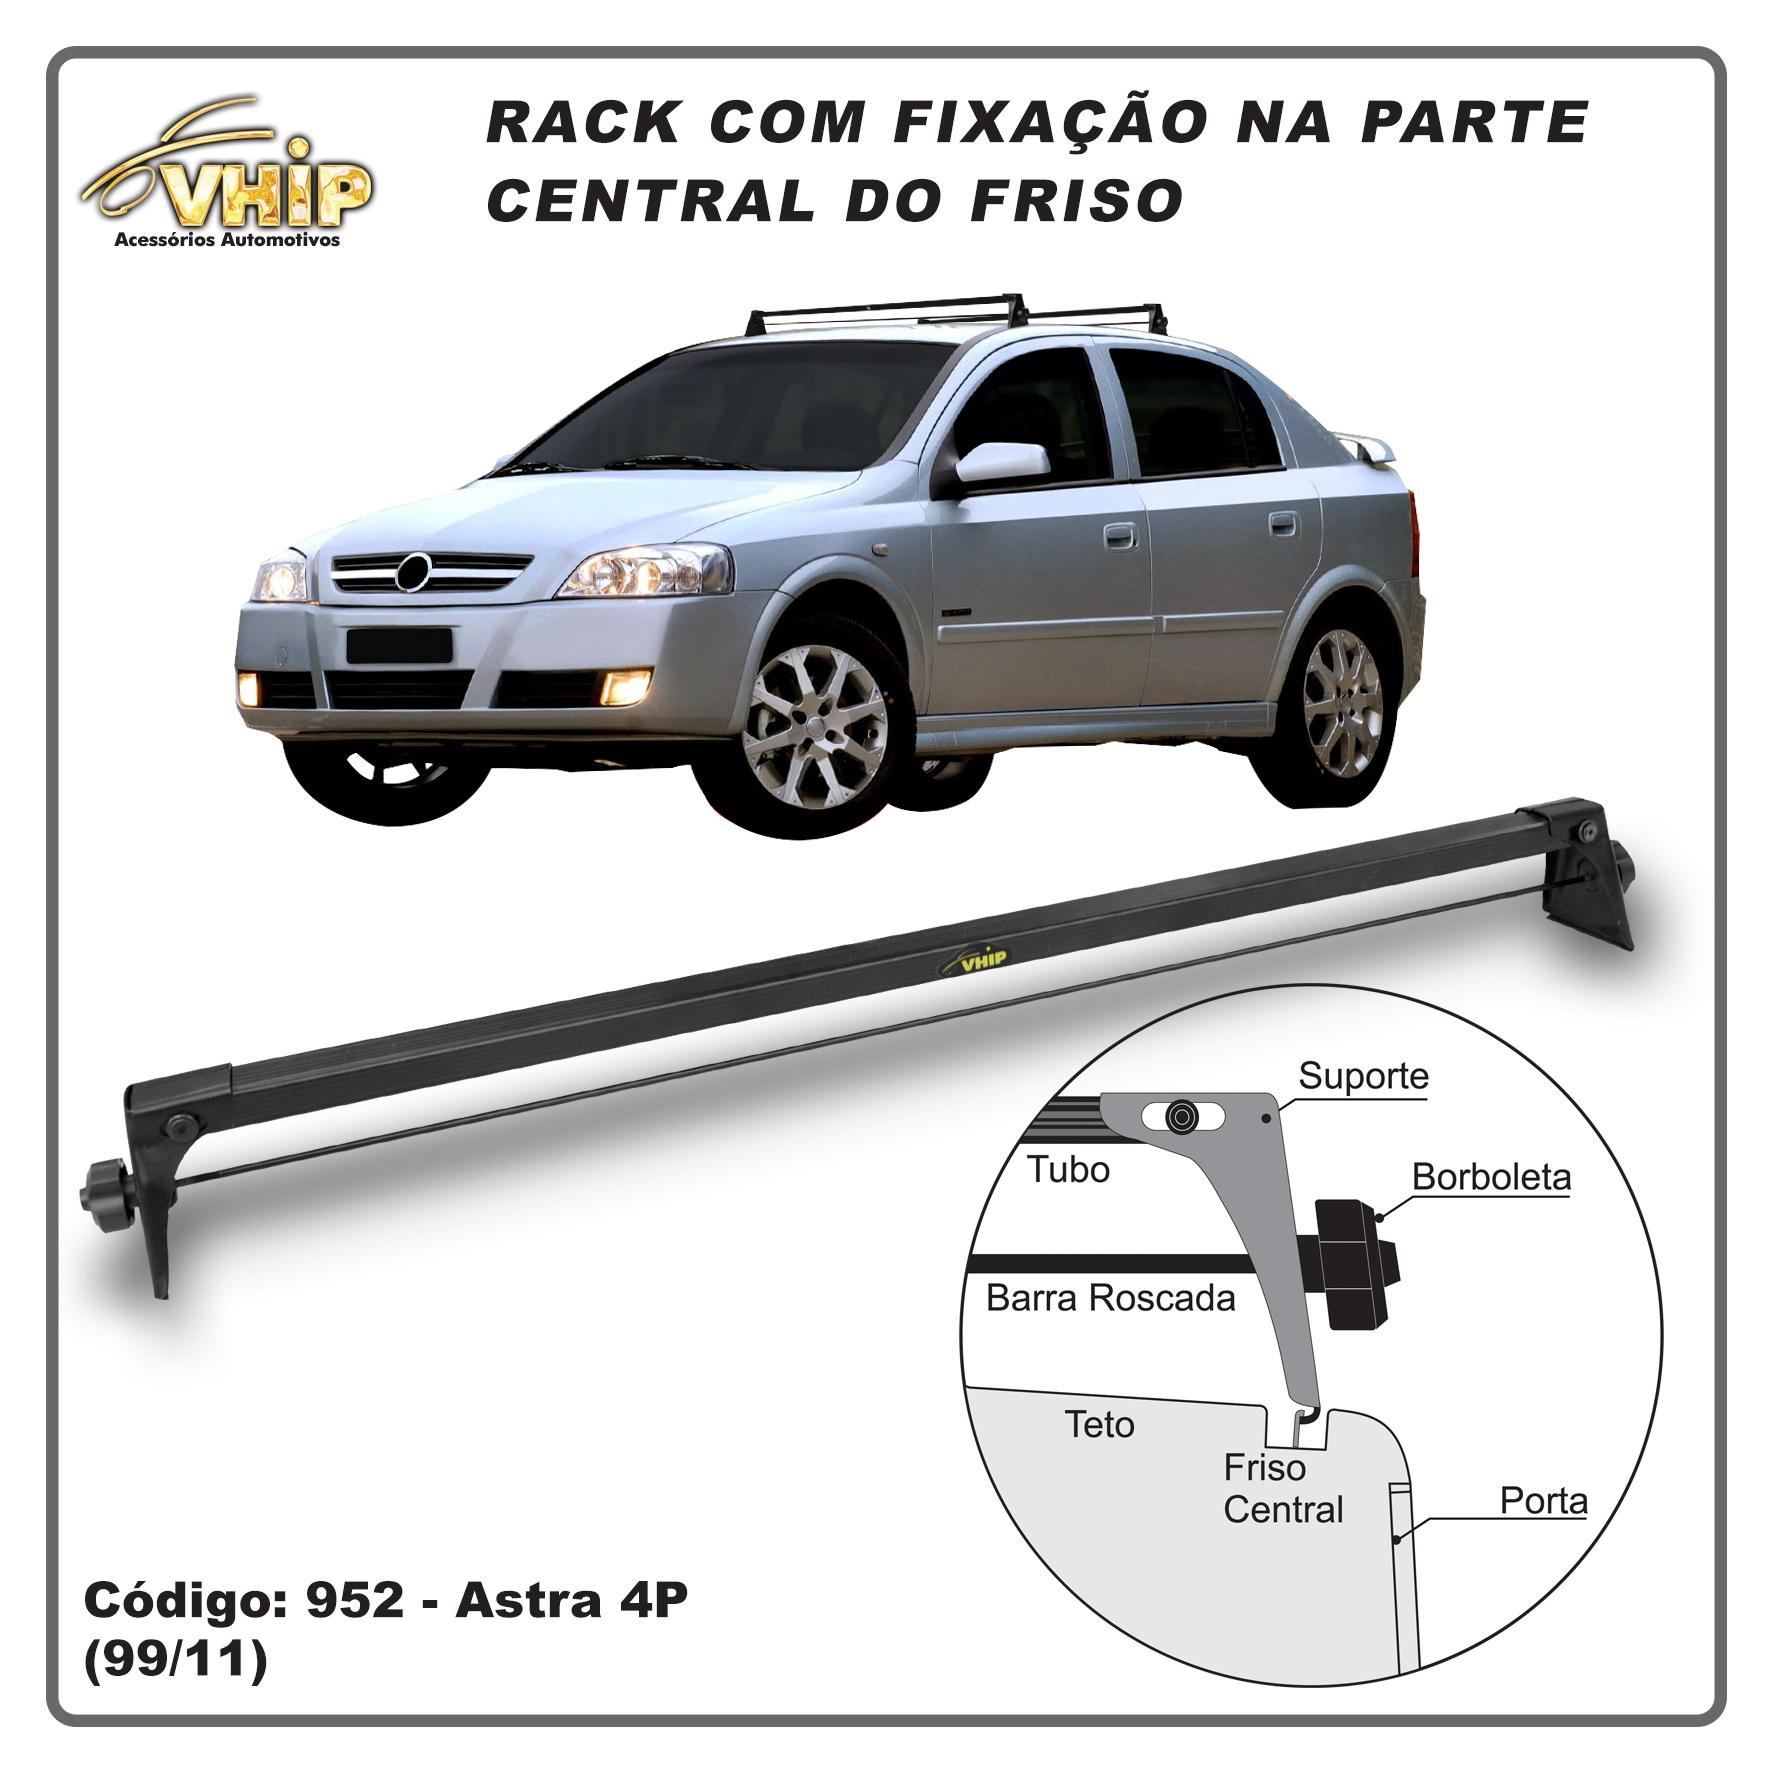 952 Astra 4P